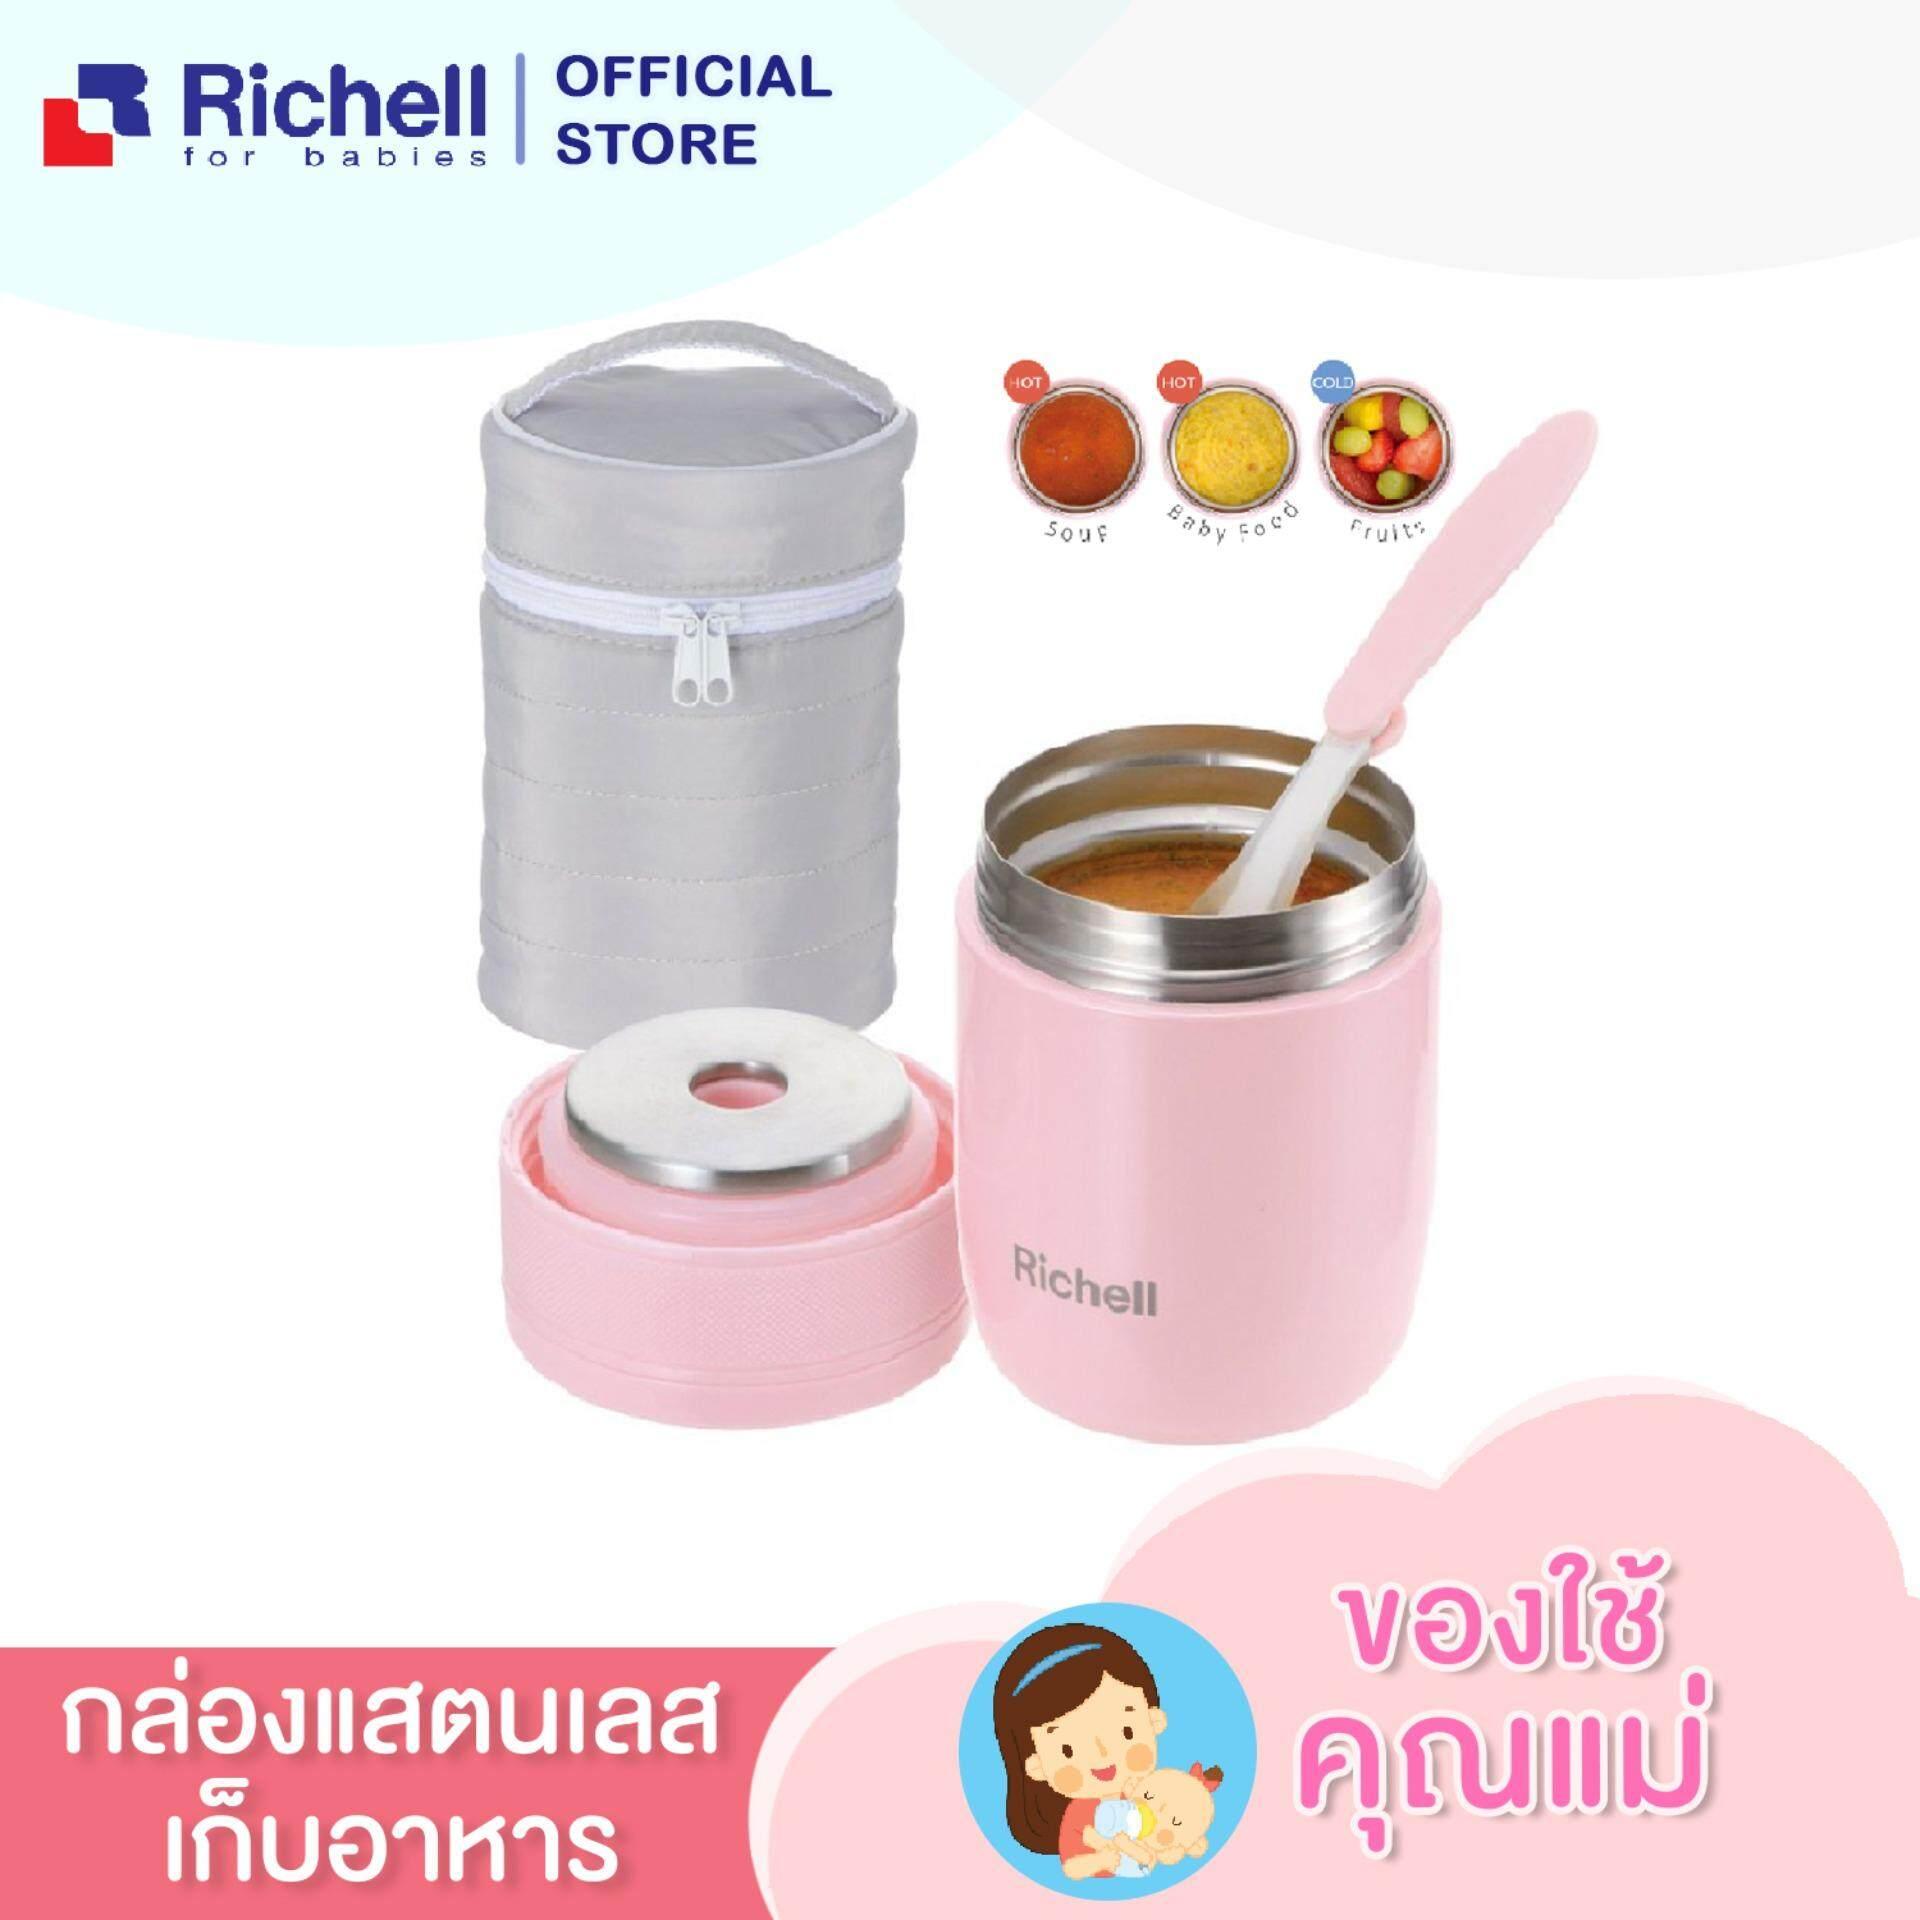 Richell ริเชล ถ้วยสแตนเลสเก็บอุณหภูมิสำหรับใส่อาหารเด็ก สีชมพู เก็บความเย็น 15 องศาได้ 6ชั่วโมงขนาด 350 ml.สำหรับเด็กวัย 6-24เดือน พร้อมกระเป๋า